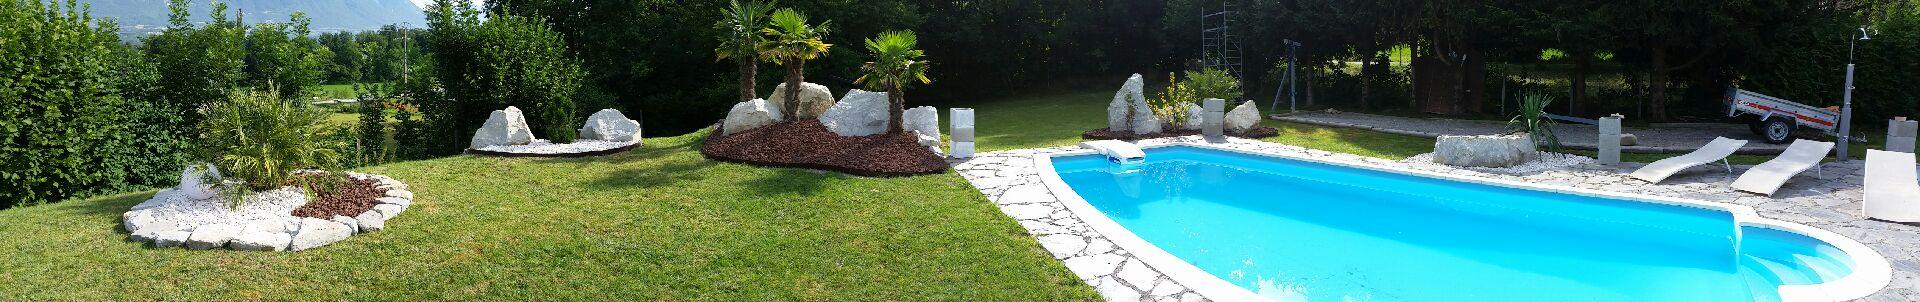 Am nagement ext rieur bron jardin paysager jfl paysage for Implantation jardin paysager